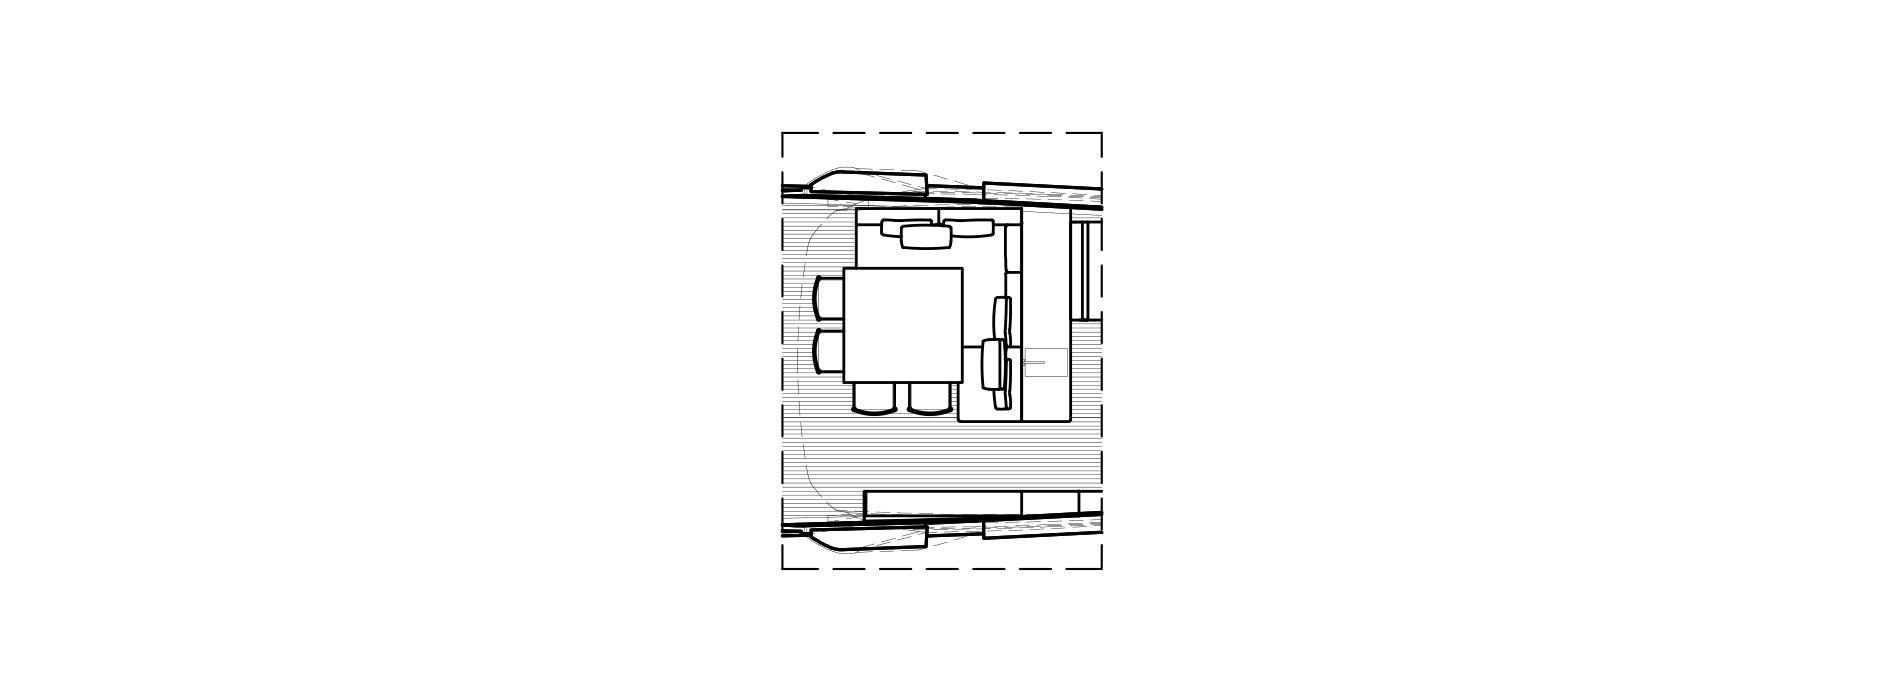 Sanlorenzo Yachts SX76 Details Versione Lissoni